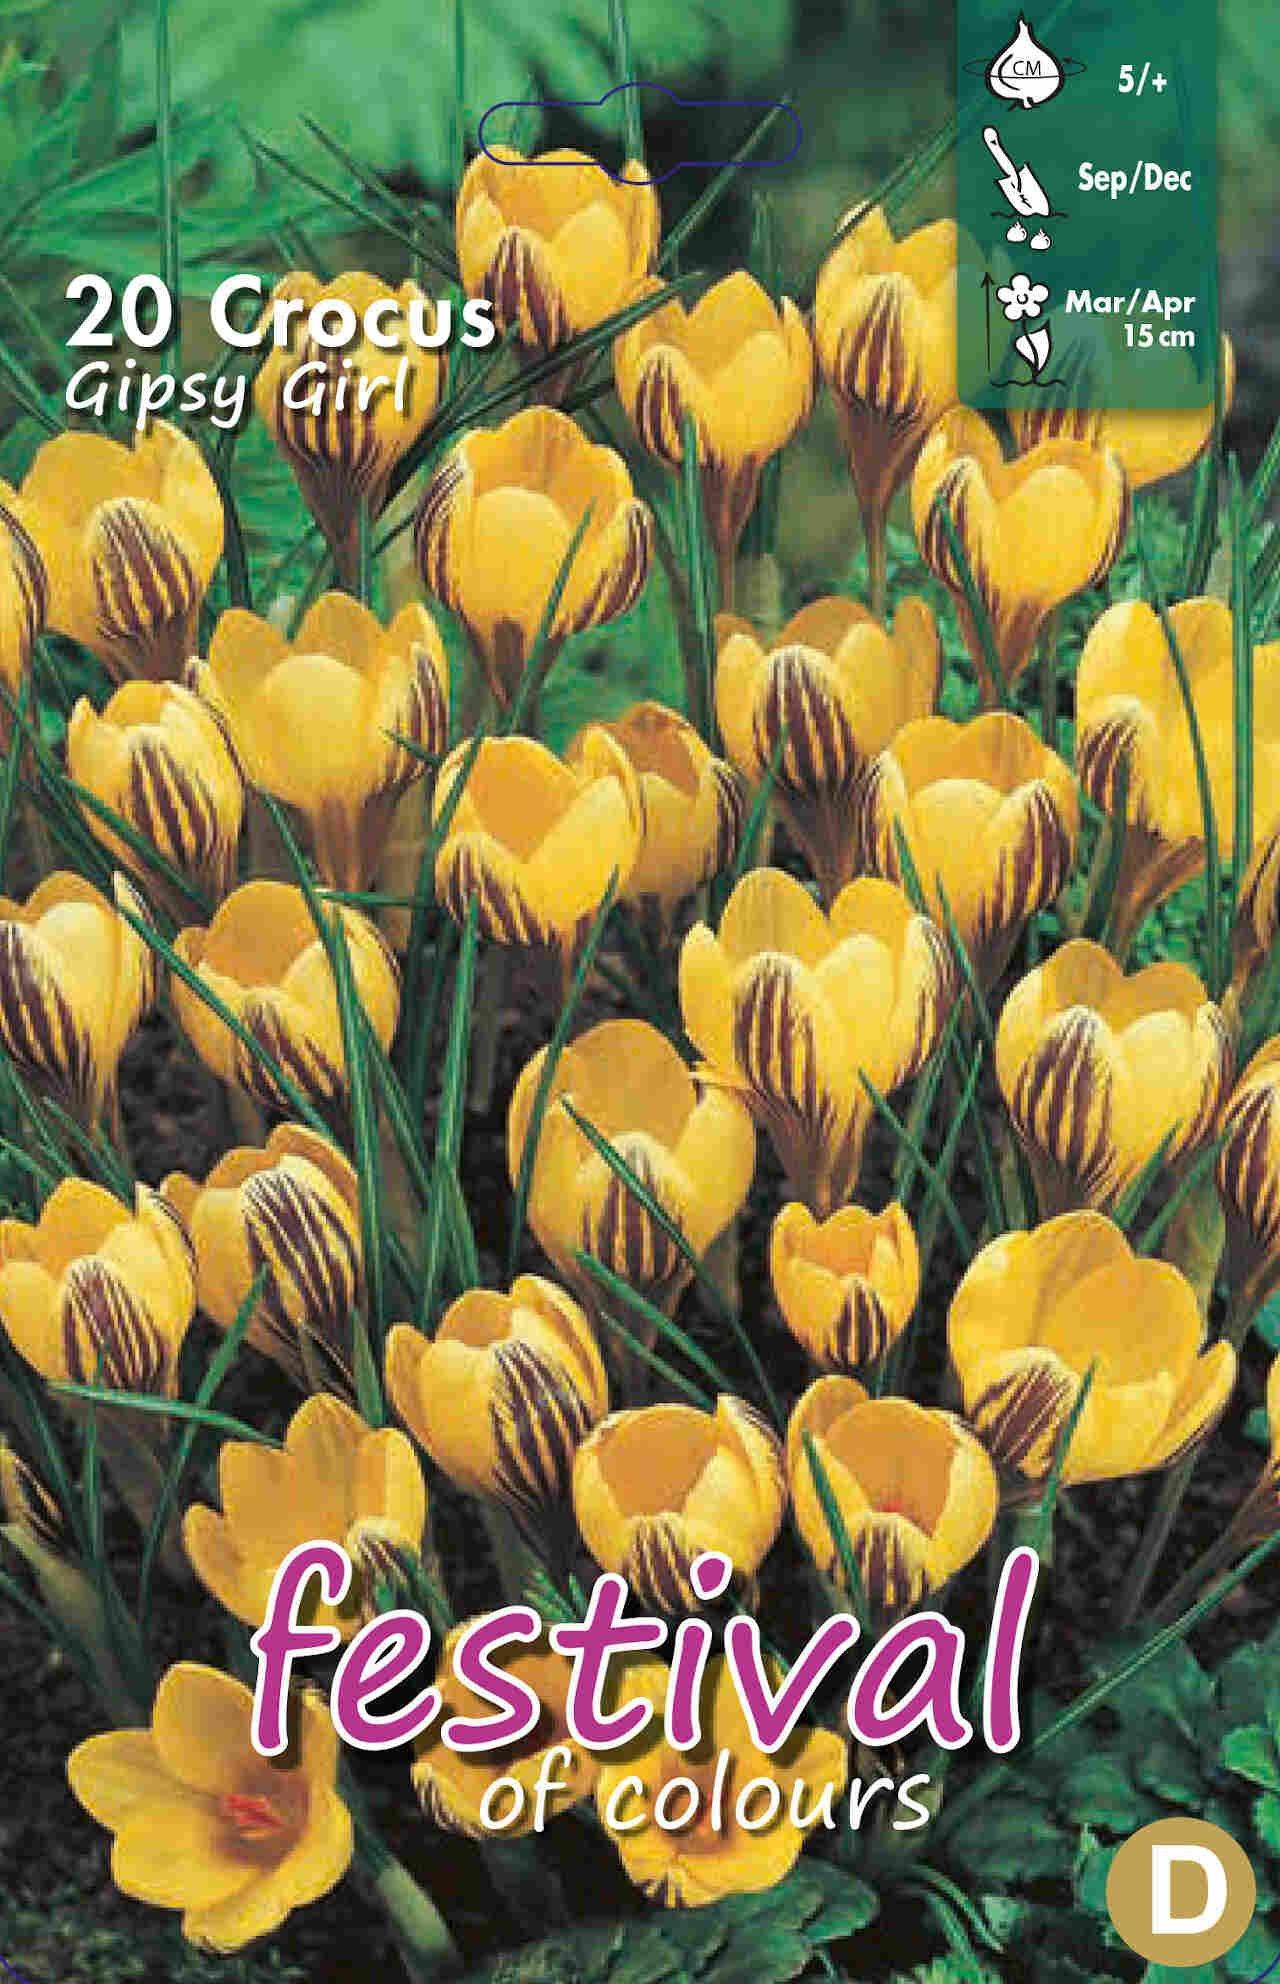 Krokus - Crocus Gipsy Girl 5/+